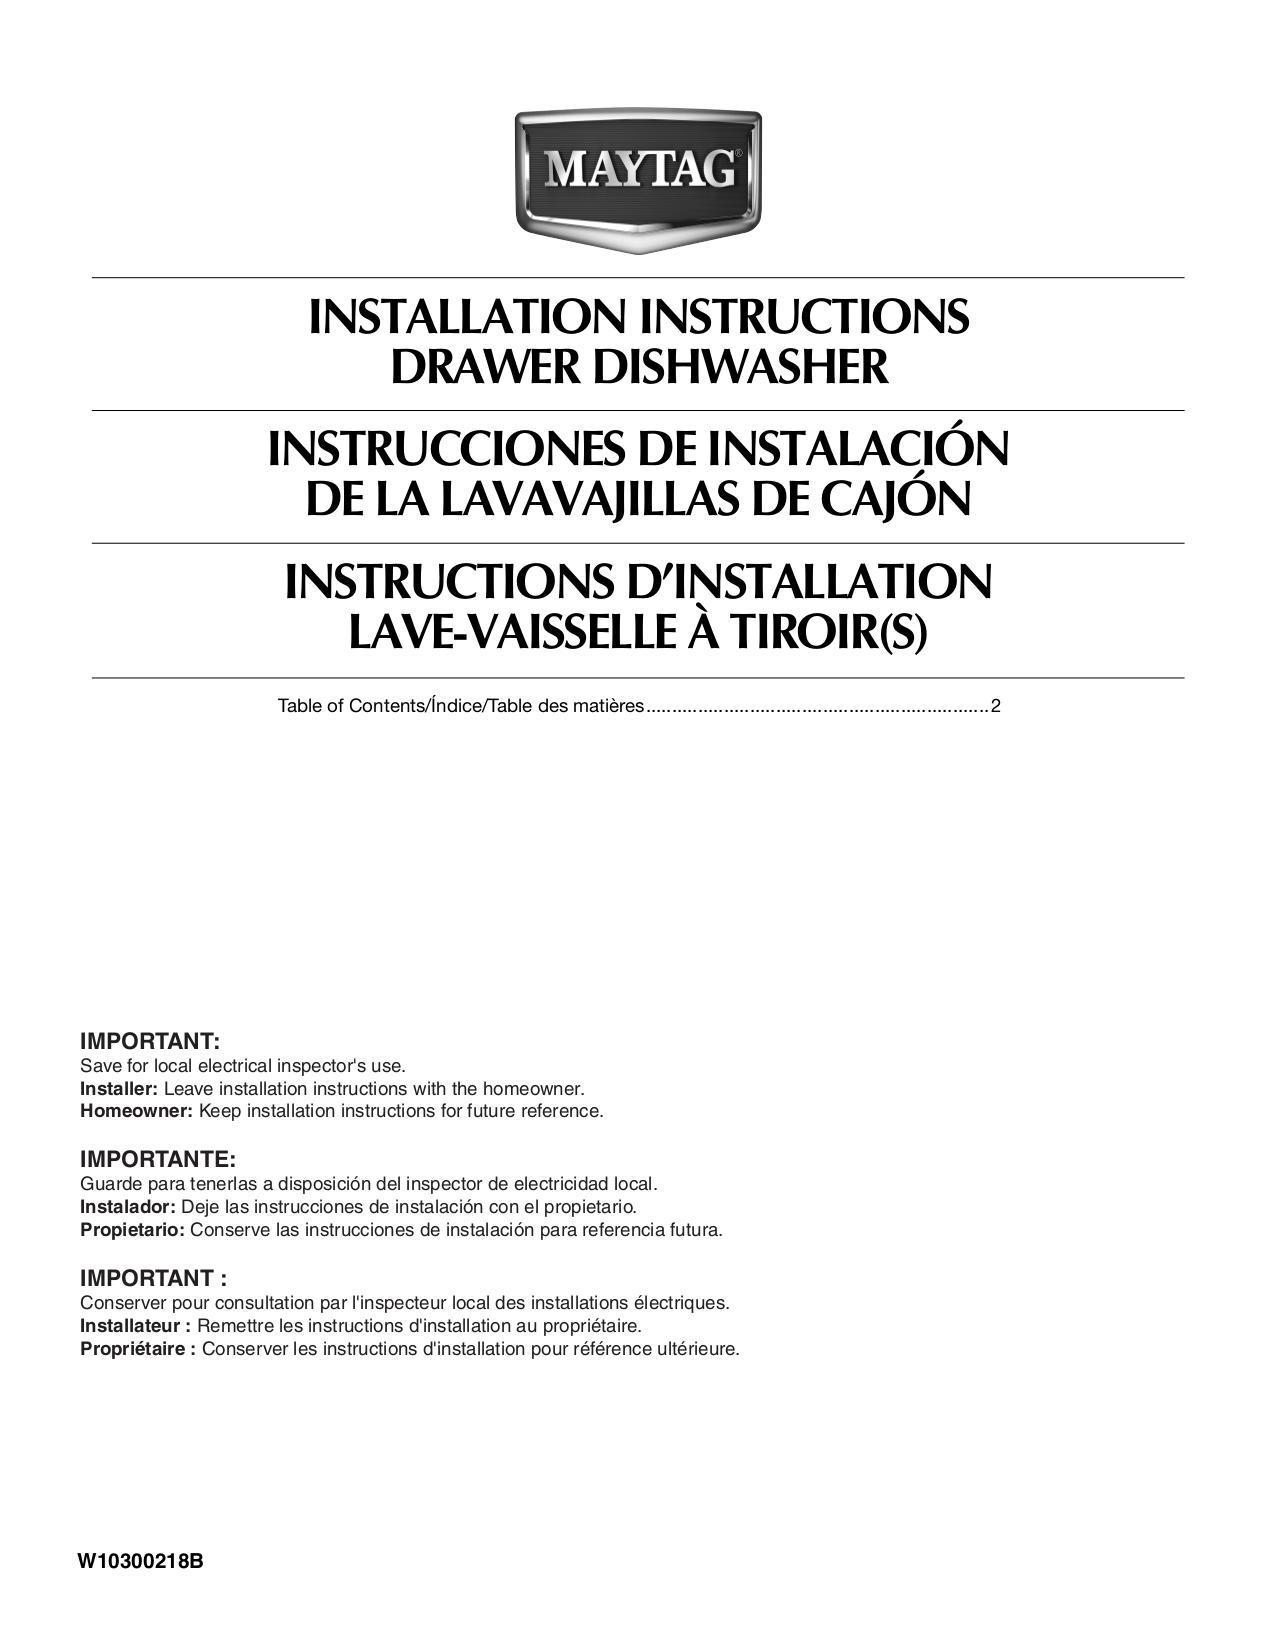 Maytag Dishwasher Installation Instructions Pdf Nemetas Mdb4651awb Parts Diagram Mdd8000aw Page Preview